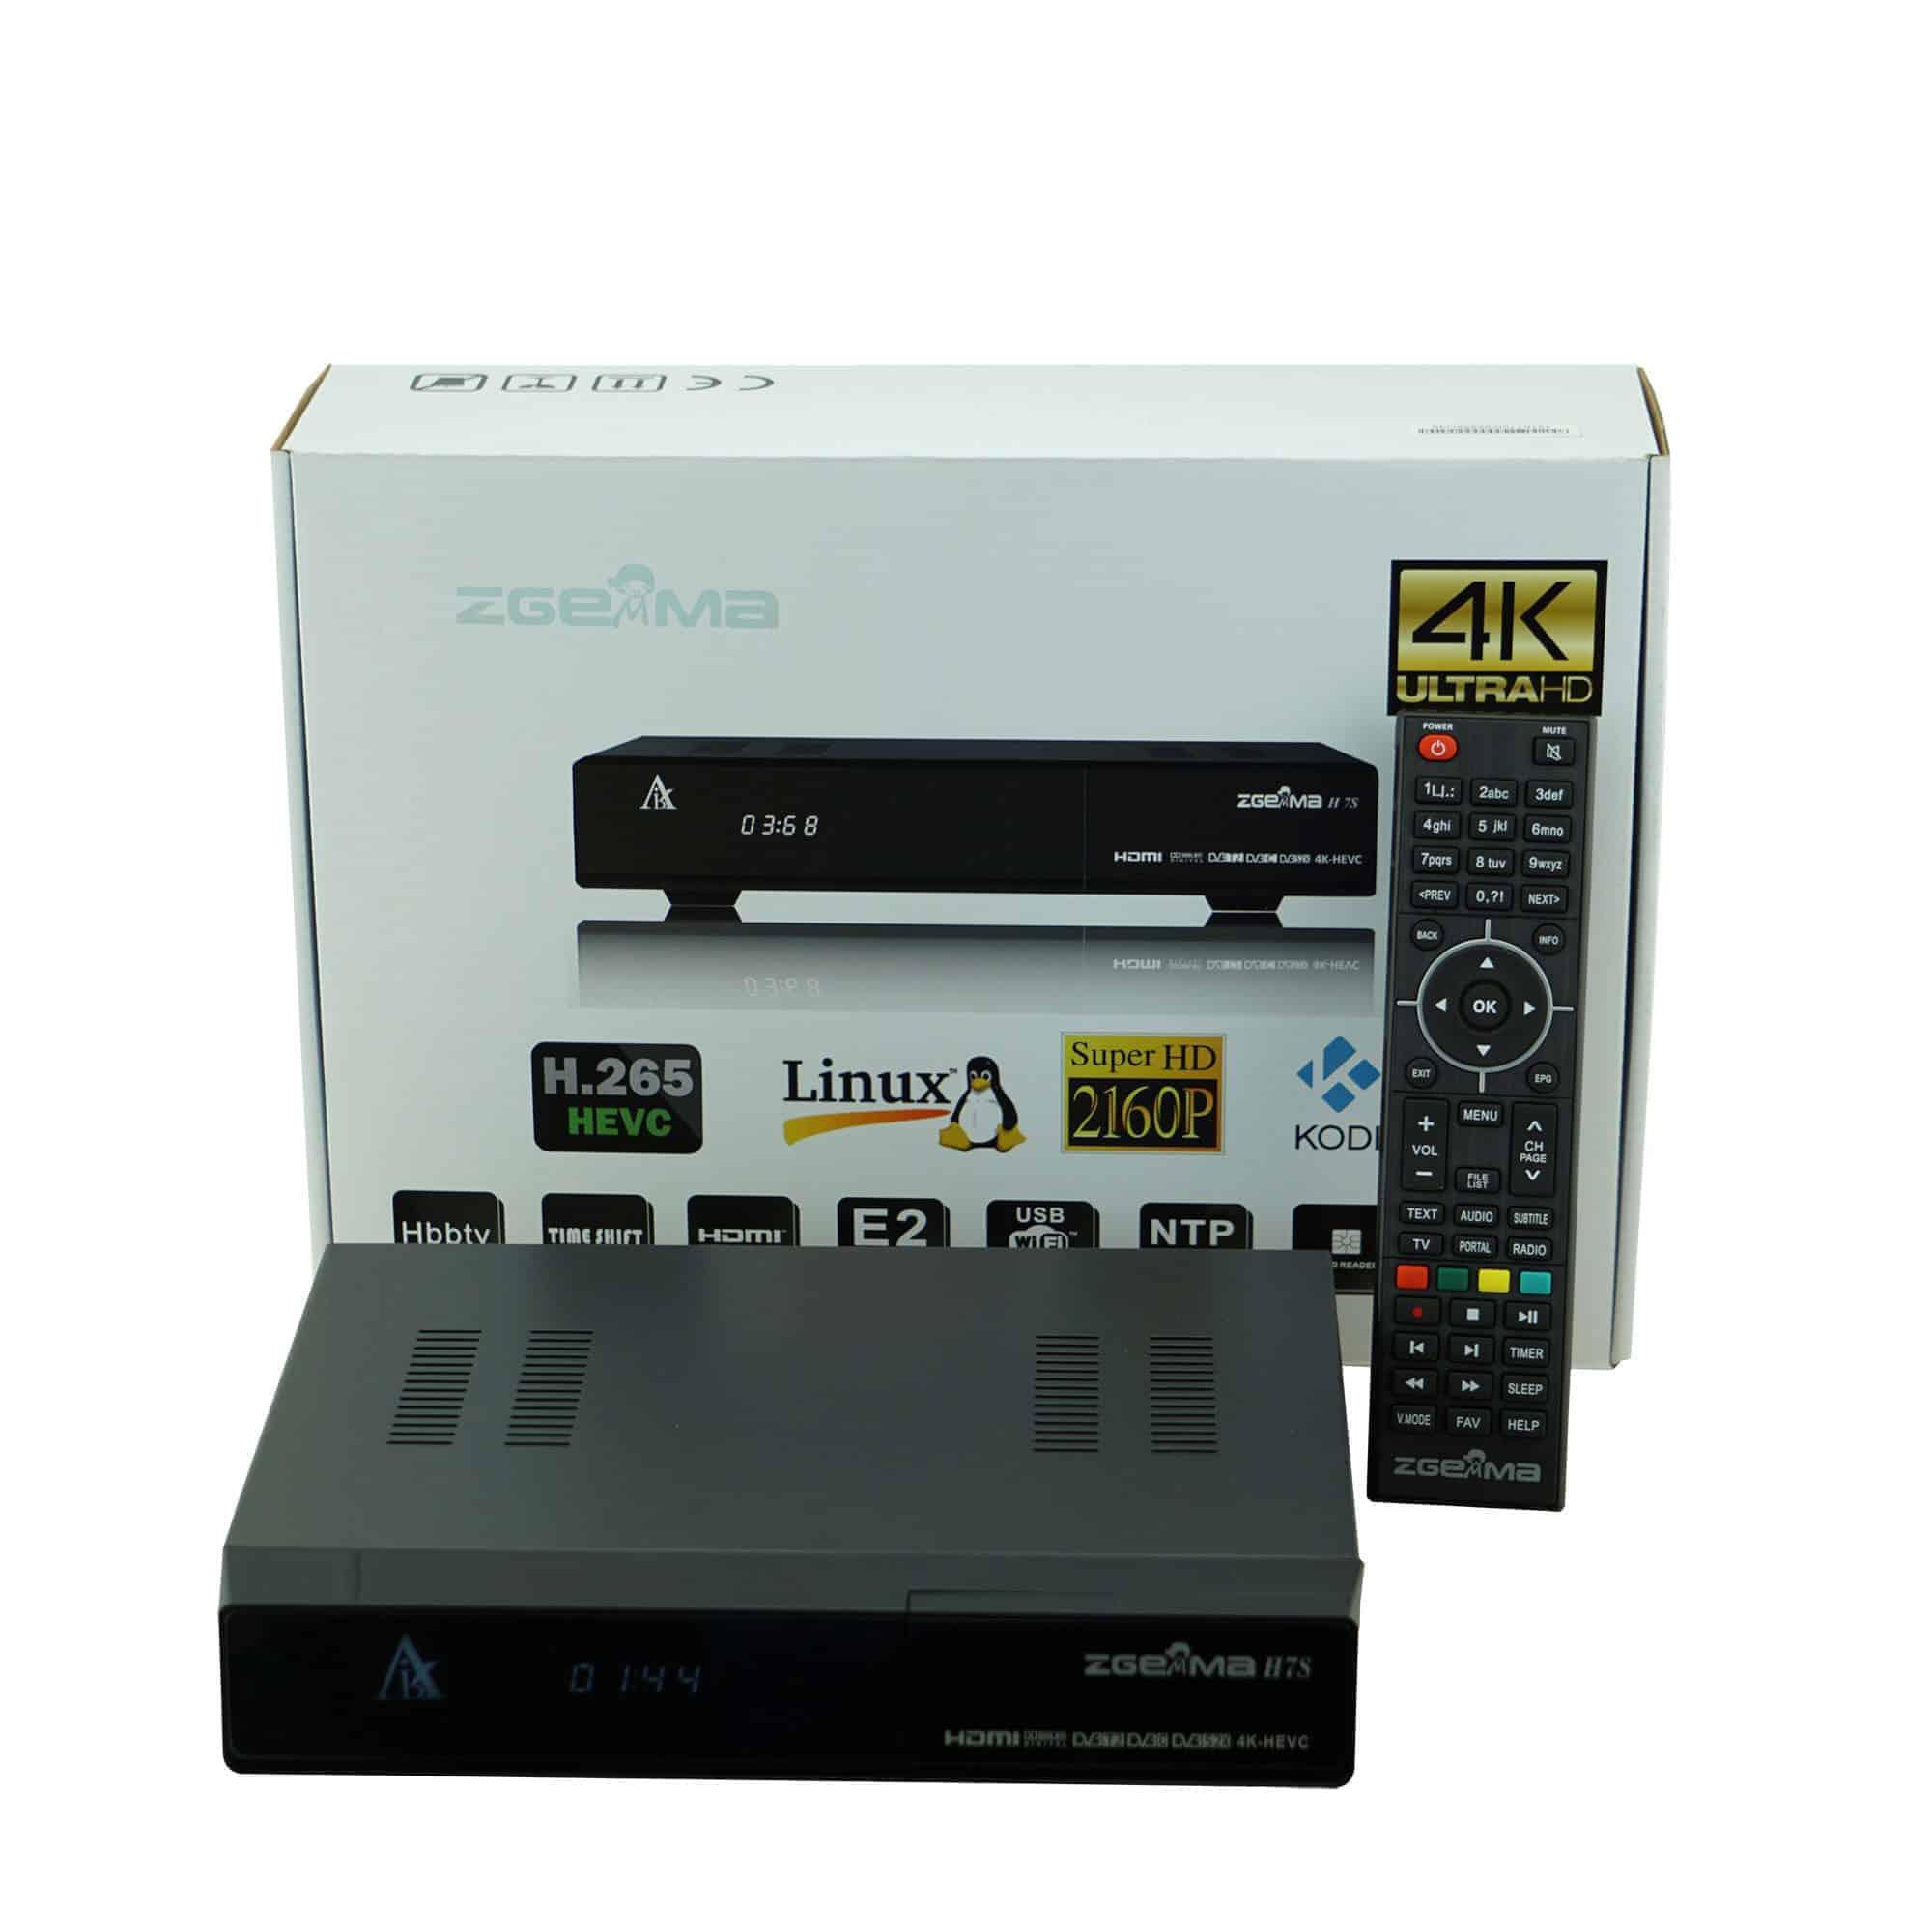 Zgemma H7S Best Fastest Box, Both Satellite and Cable 2 x DVB-S2X + 1 x  DVB-T2/C, Zgemma 4K Receiver - UHD - H 265 TV BOX